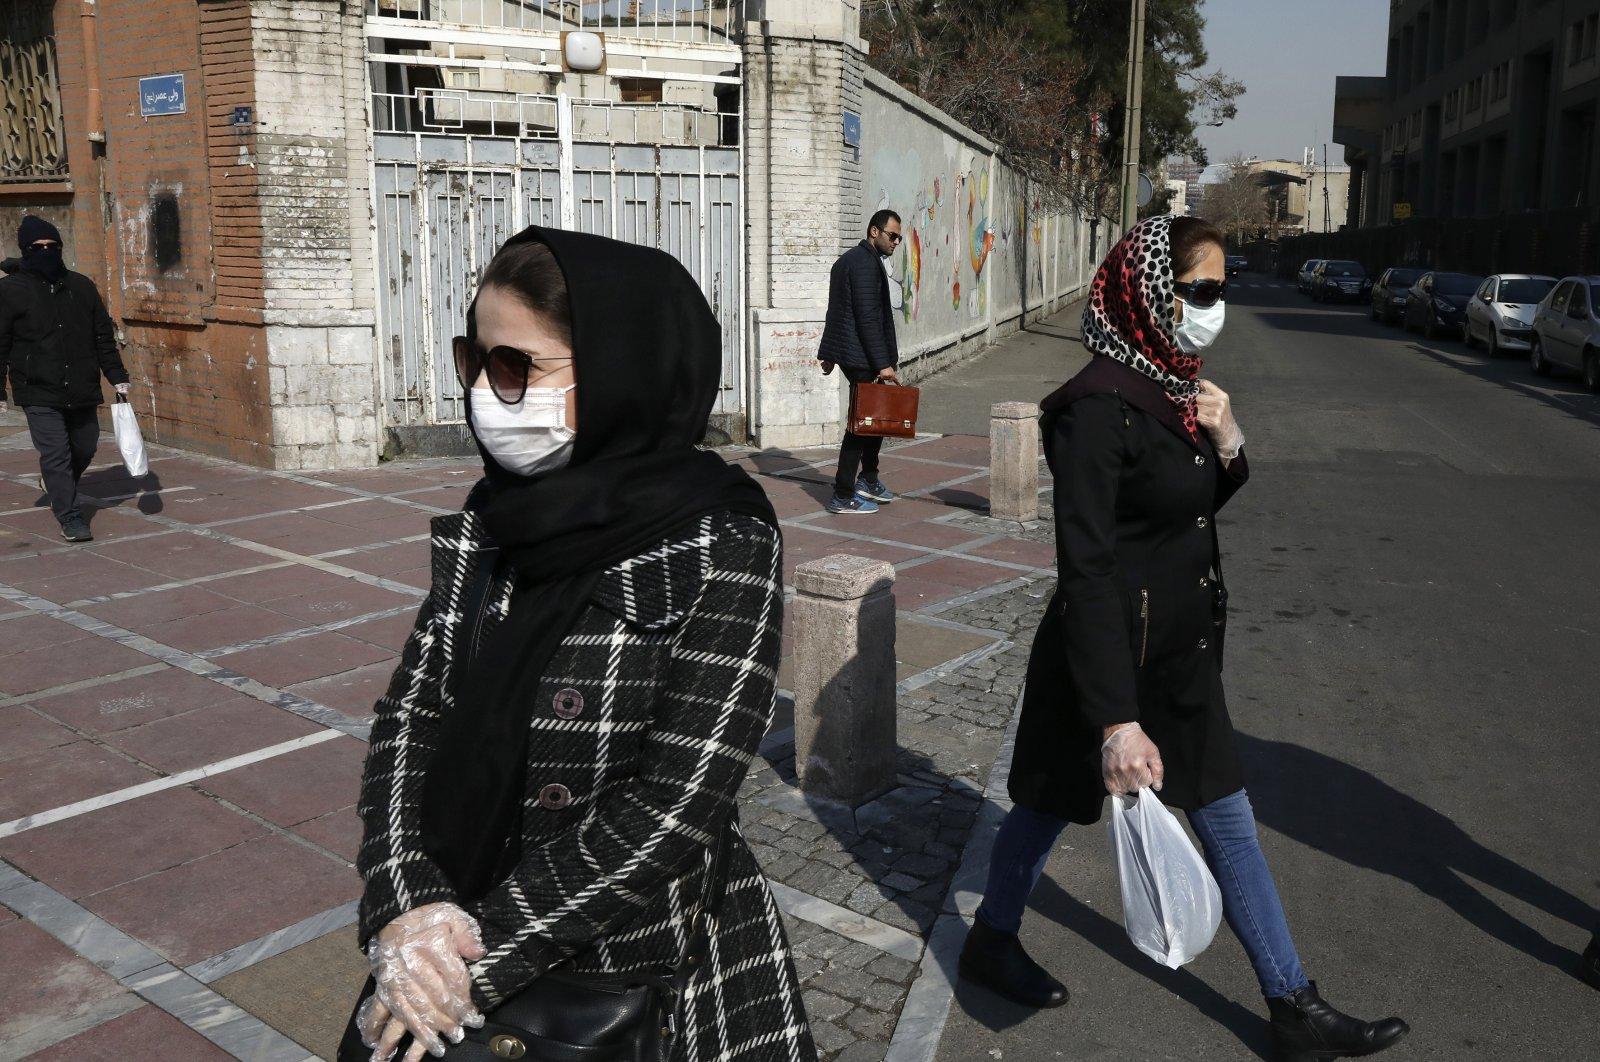 Pedestrians walk as some of them wear masks in downtown Tehran, Iran, Feb. 27, 2020. (AP Photo)